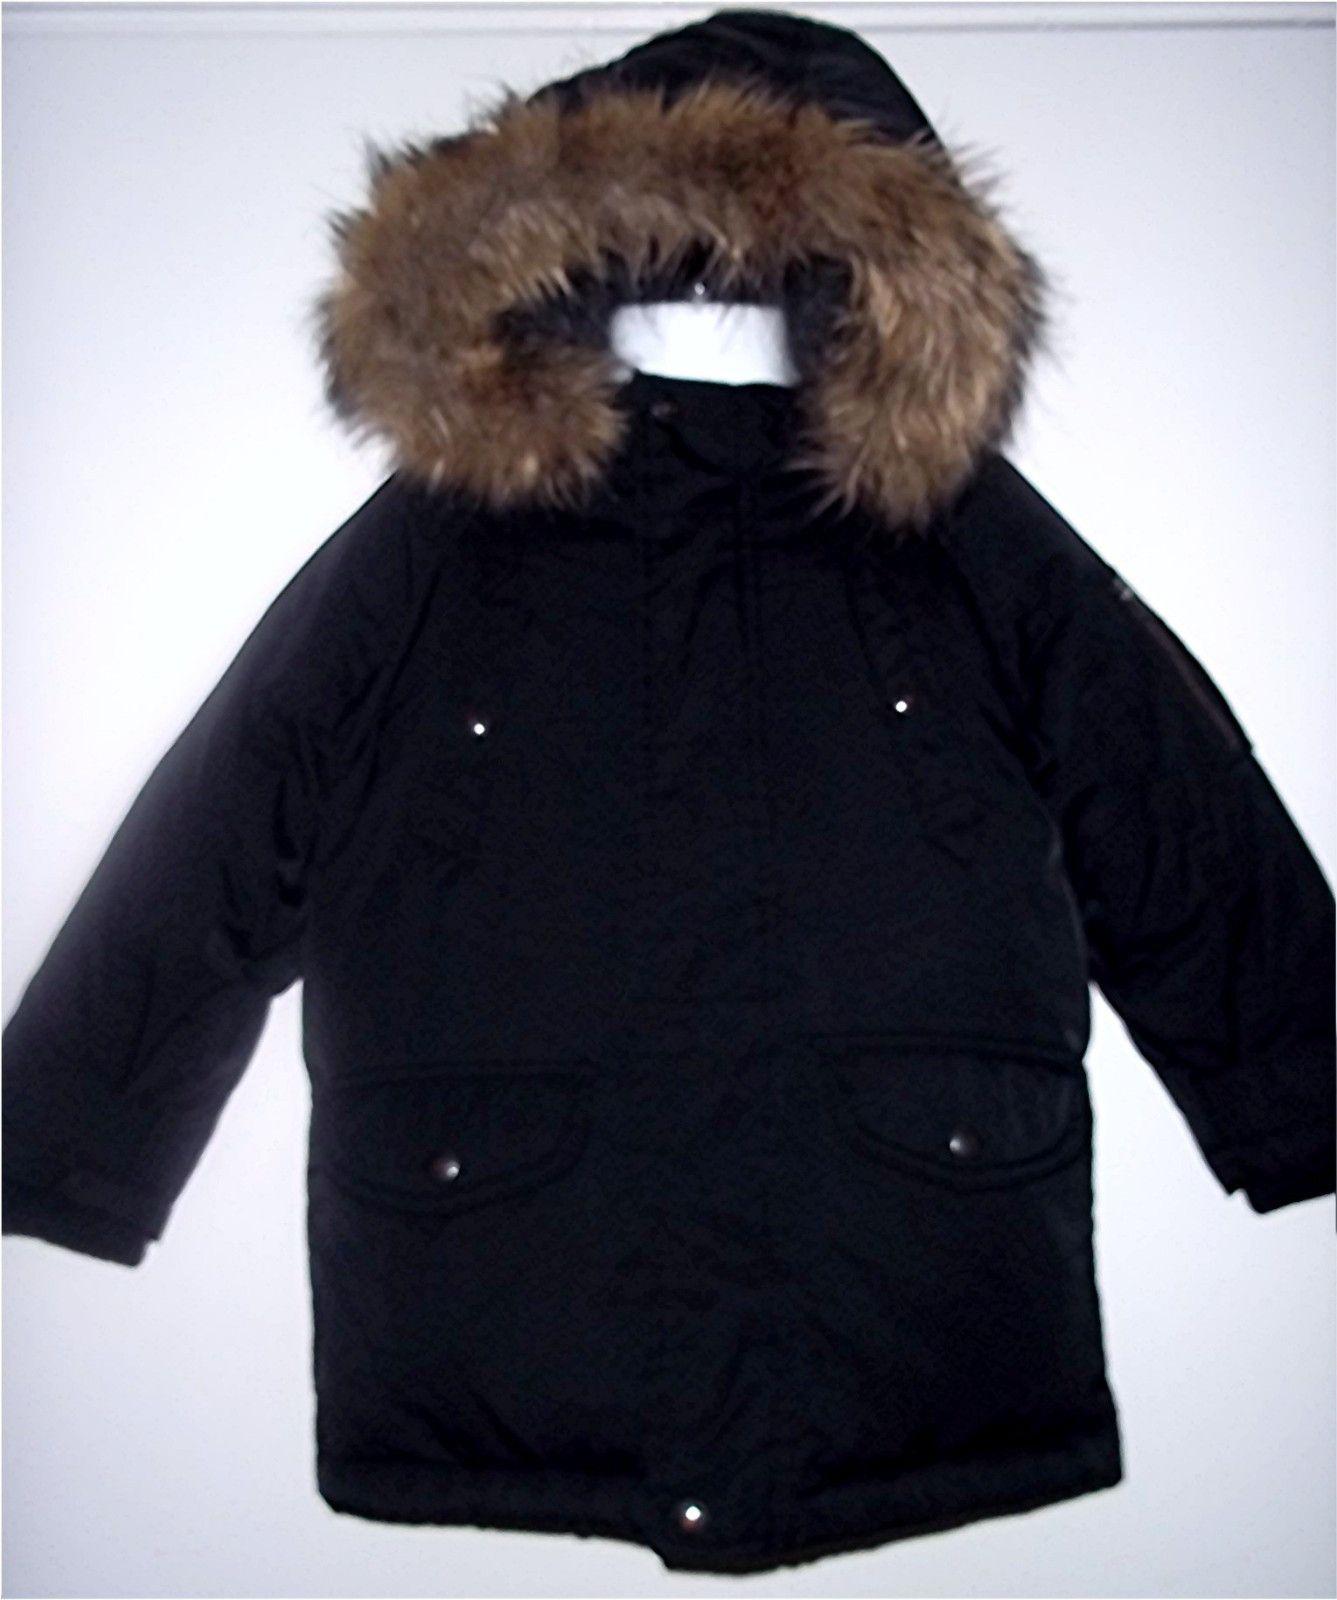 cb635d2a0d2 Baby Gap Boy Black Warmest Winter Down Coat Hooded Fur Jacket Parka ...